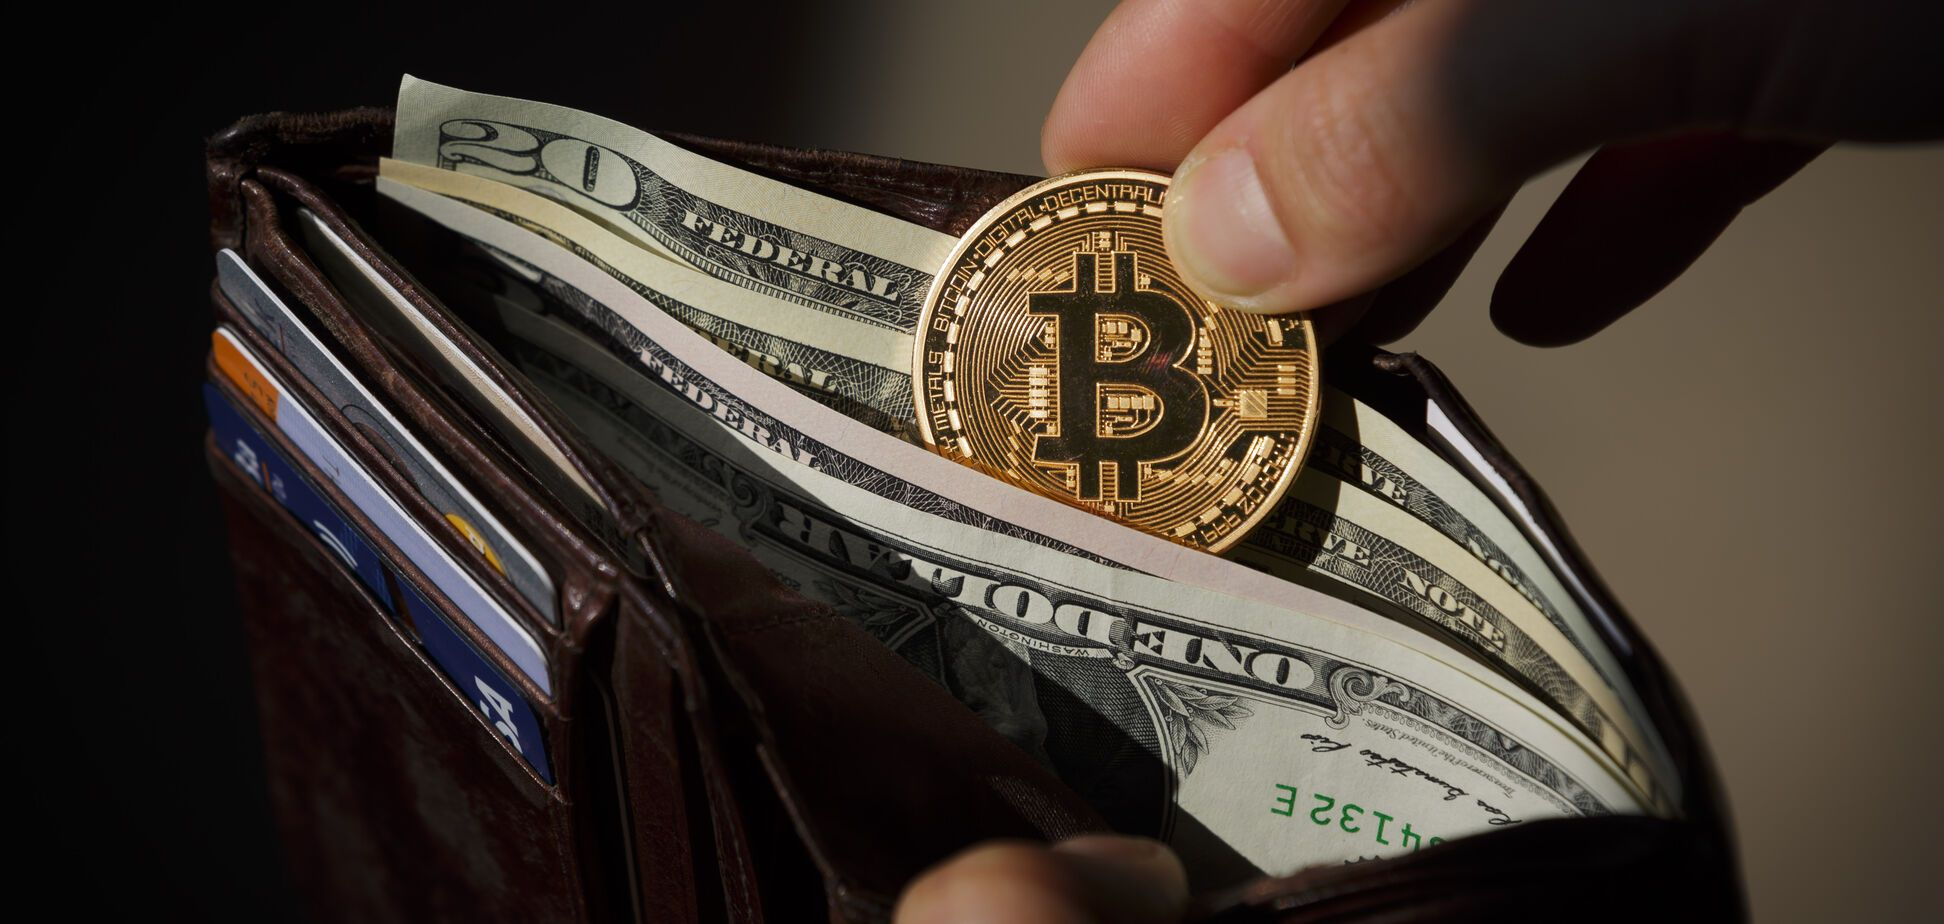 Курс на $13 тысяч: биткоин установил новый исторический рекорд